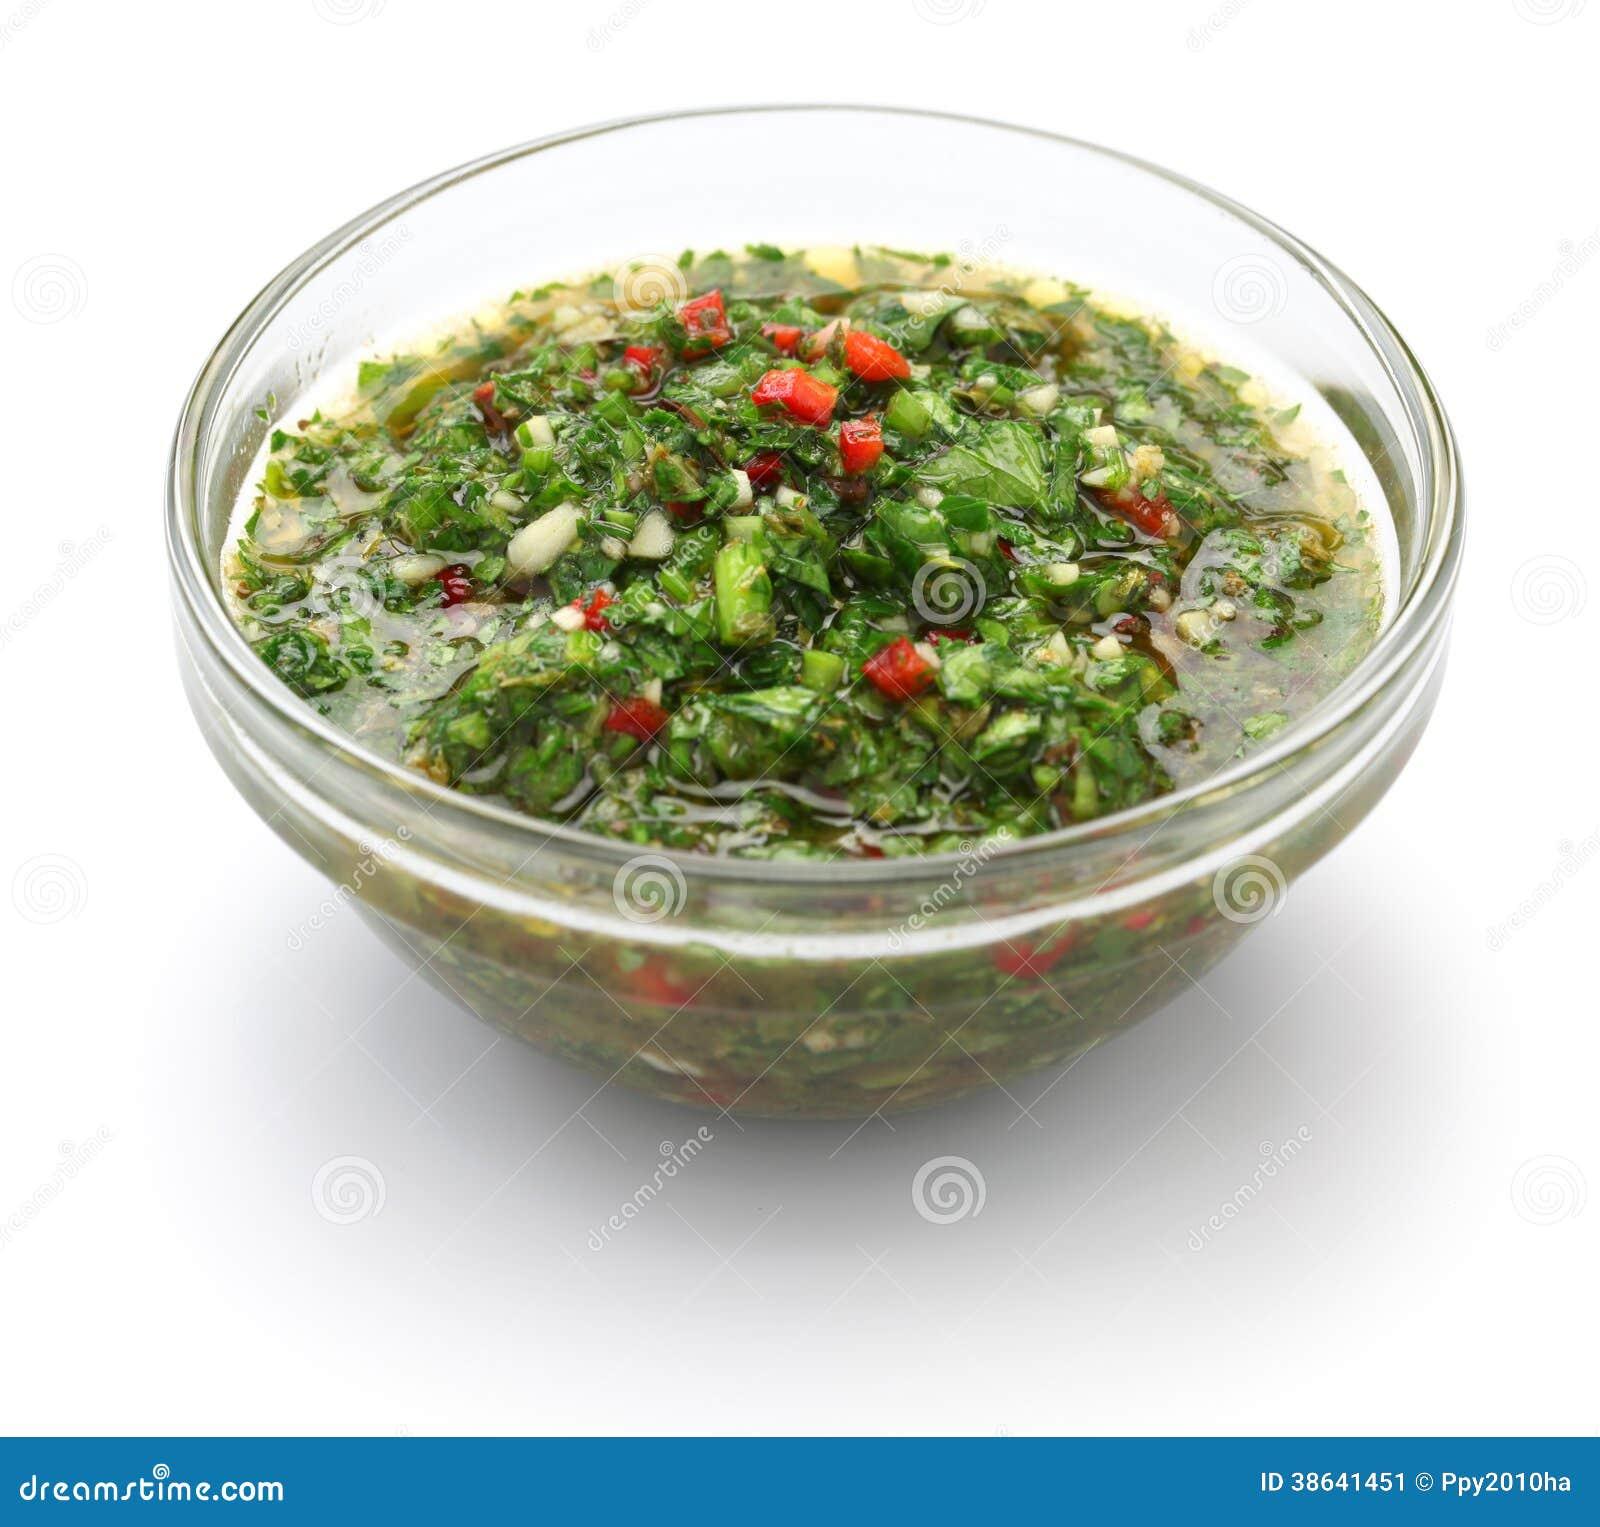 chimichurri sauce traditional argentine condiment stock image image